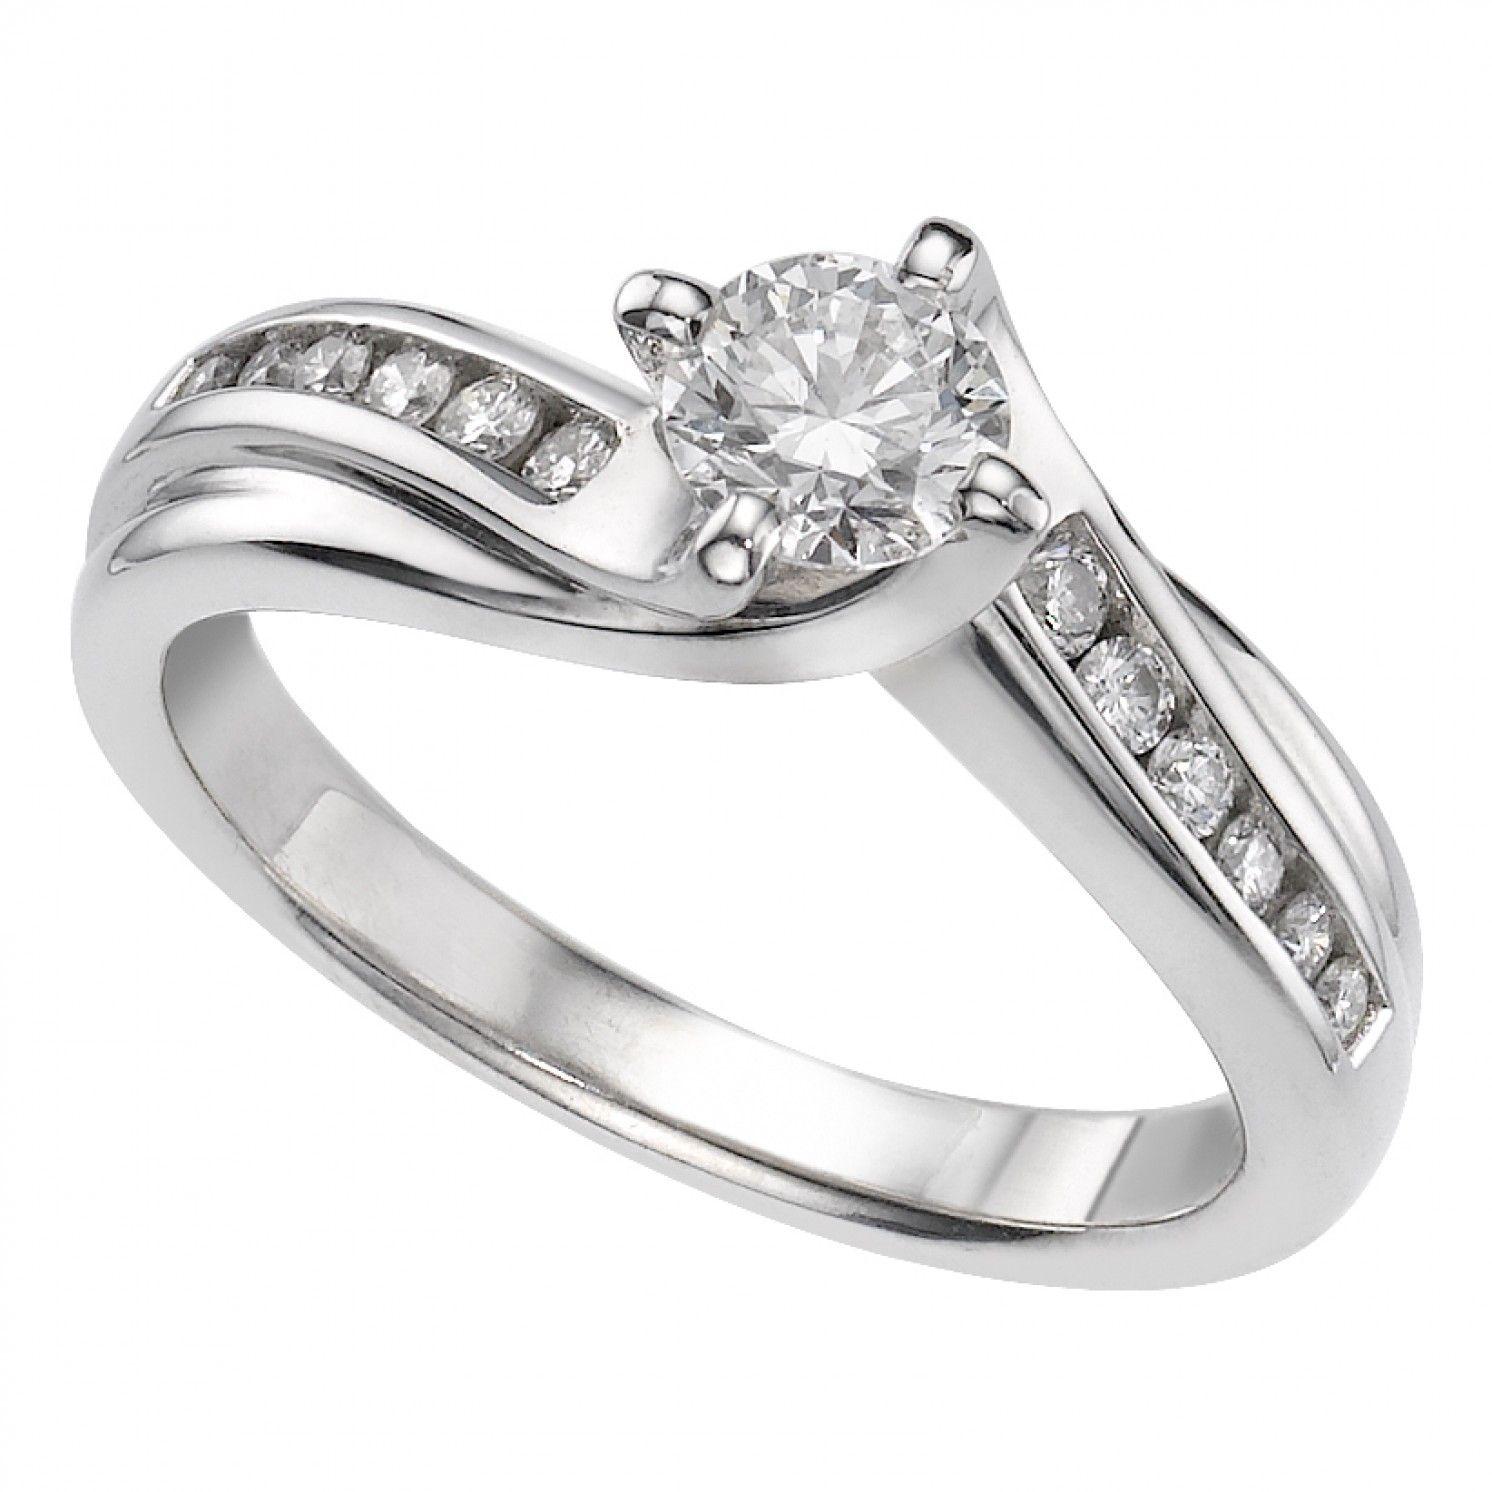 18ct white gold 0.63 carat diamond ring Diamond